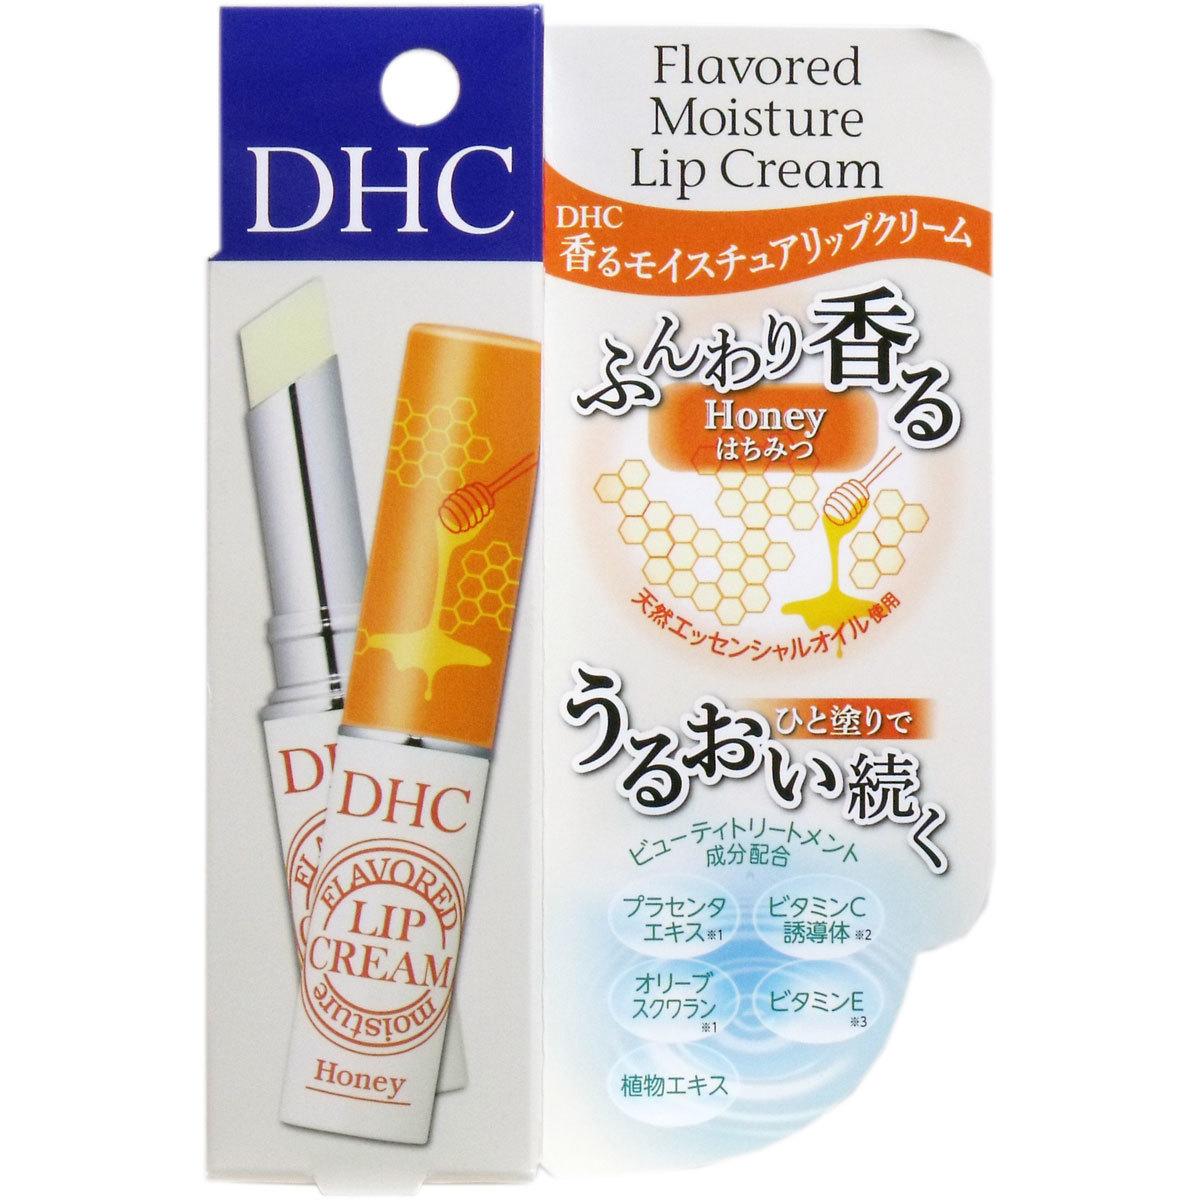 DHC香保濕唇膏蜂蜜1.5克